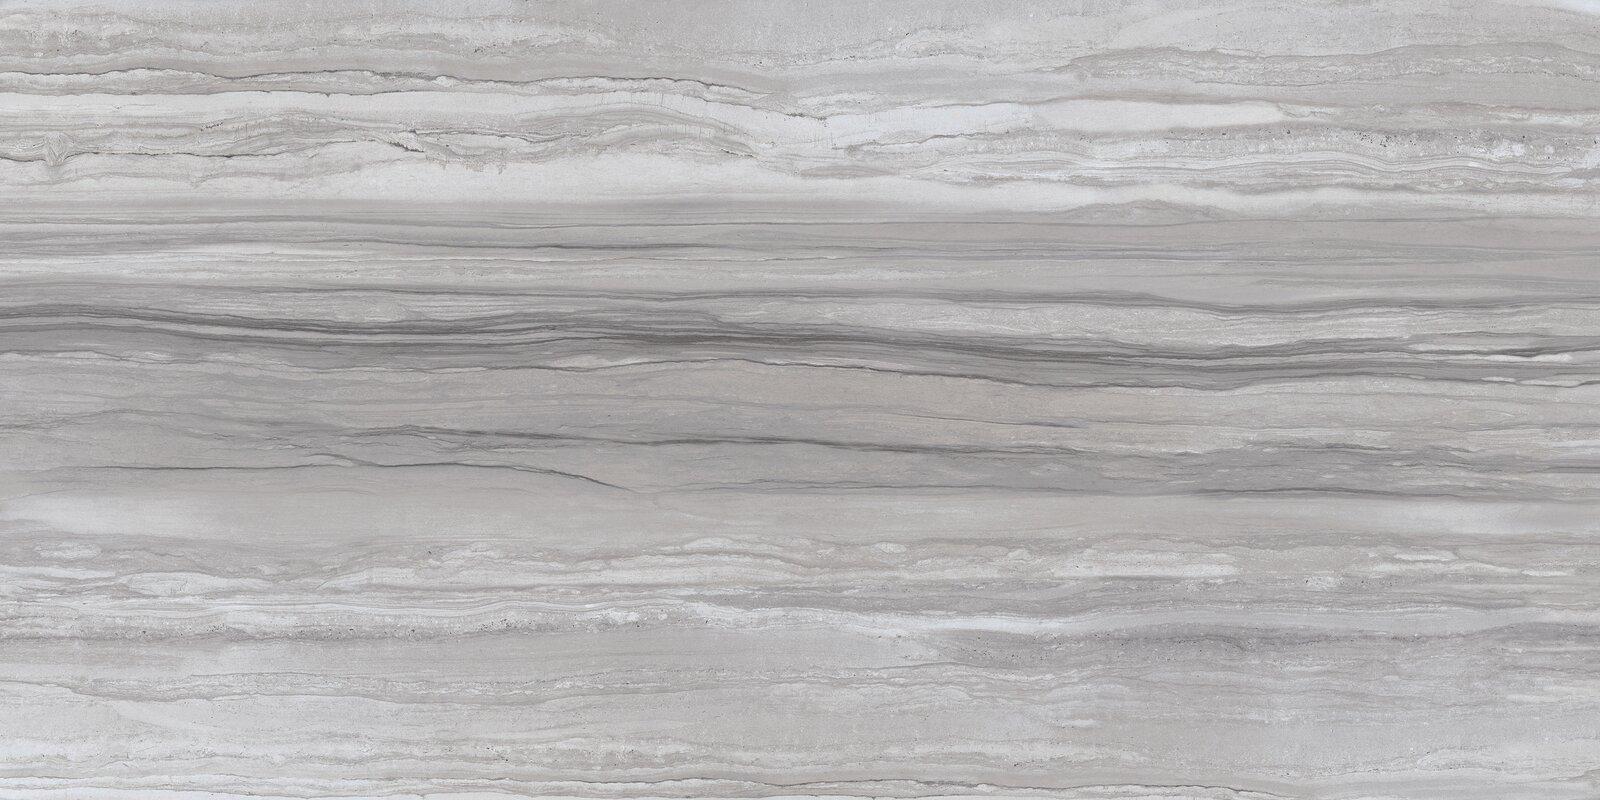 Cute 16 Ceramic Tile Huge 1930S Floor Tiles Reproduction Regular 2 Inch Hexagon Floor Tile 24 X 48 Ceiling Tiles Drop Ceiling Youthful 2X2 Floor Tile Fresh2X6 Subway Tile Emser Tile Ciudad 12\